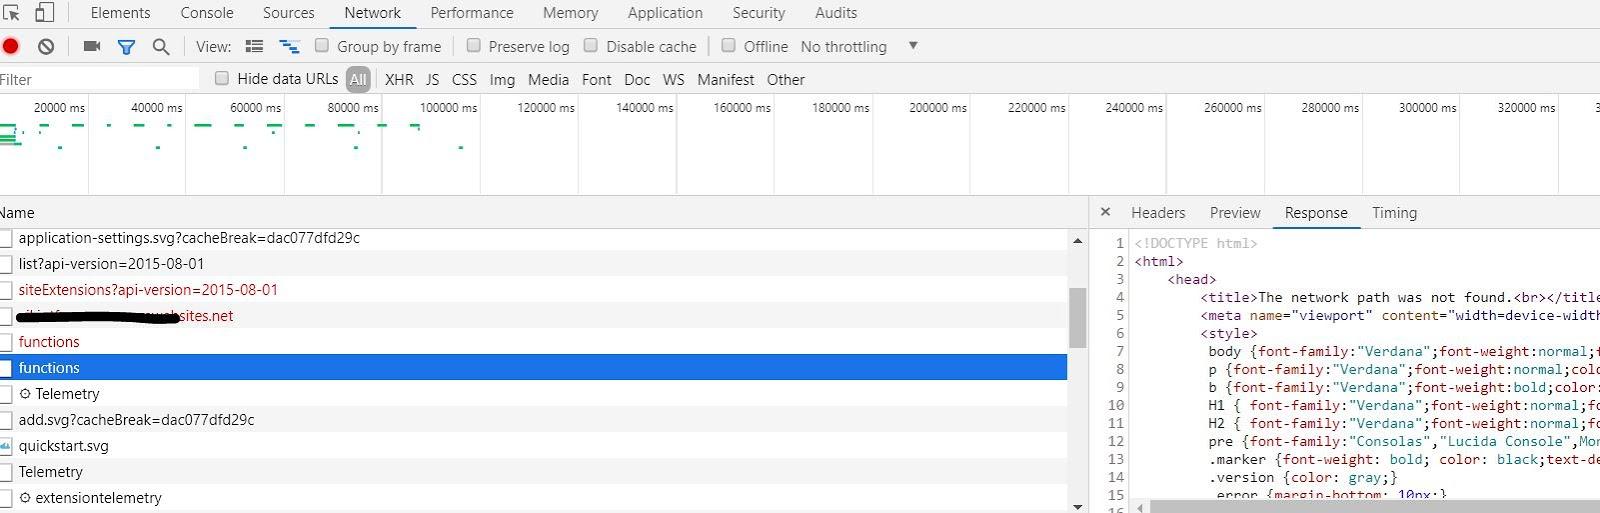 Azure App Services !!! Web app, Azure functions aka Function